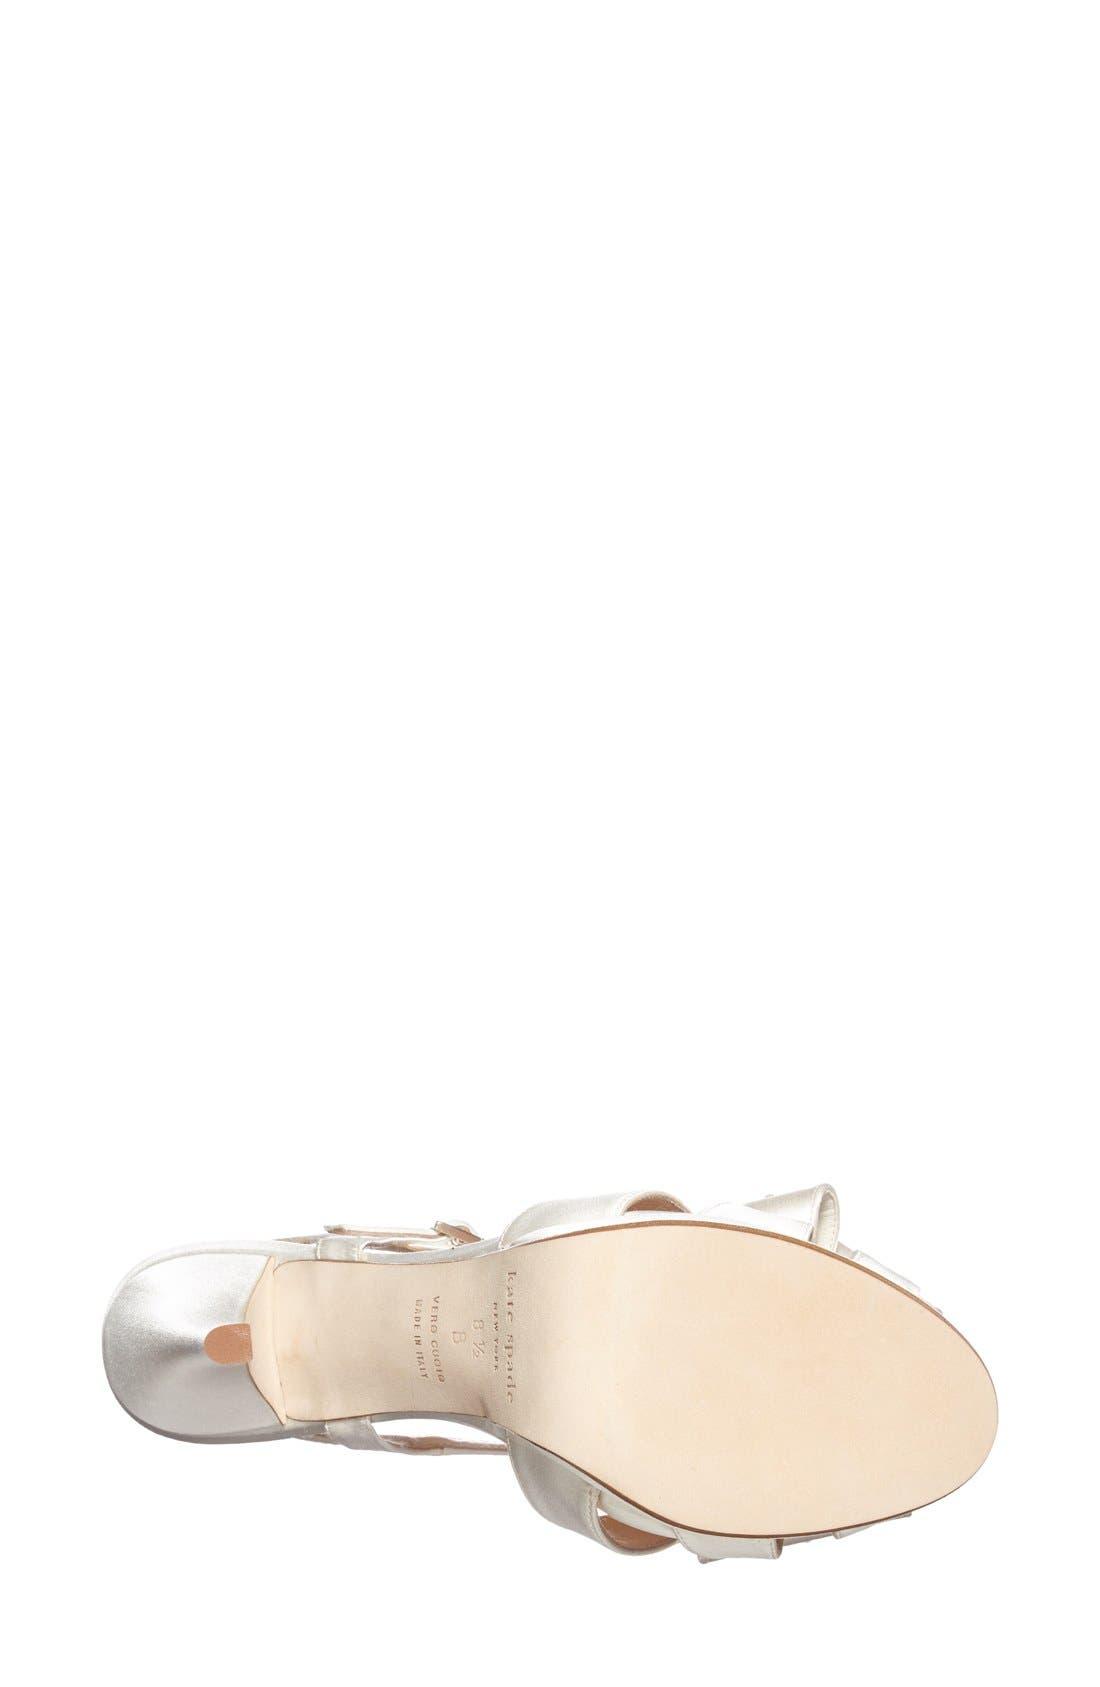 Alternate Image 3  - kate spade new york 'ribbon' sandal (Women)